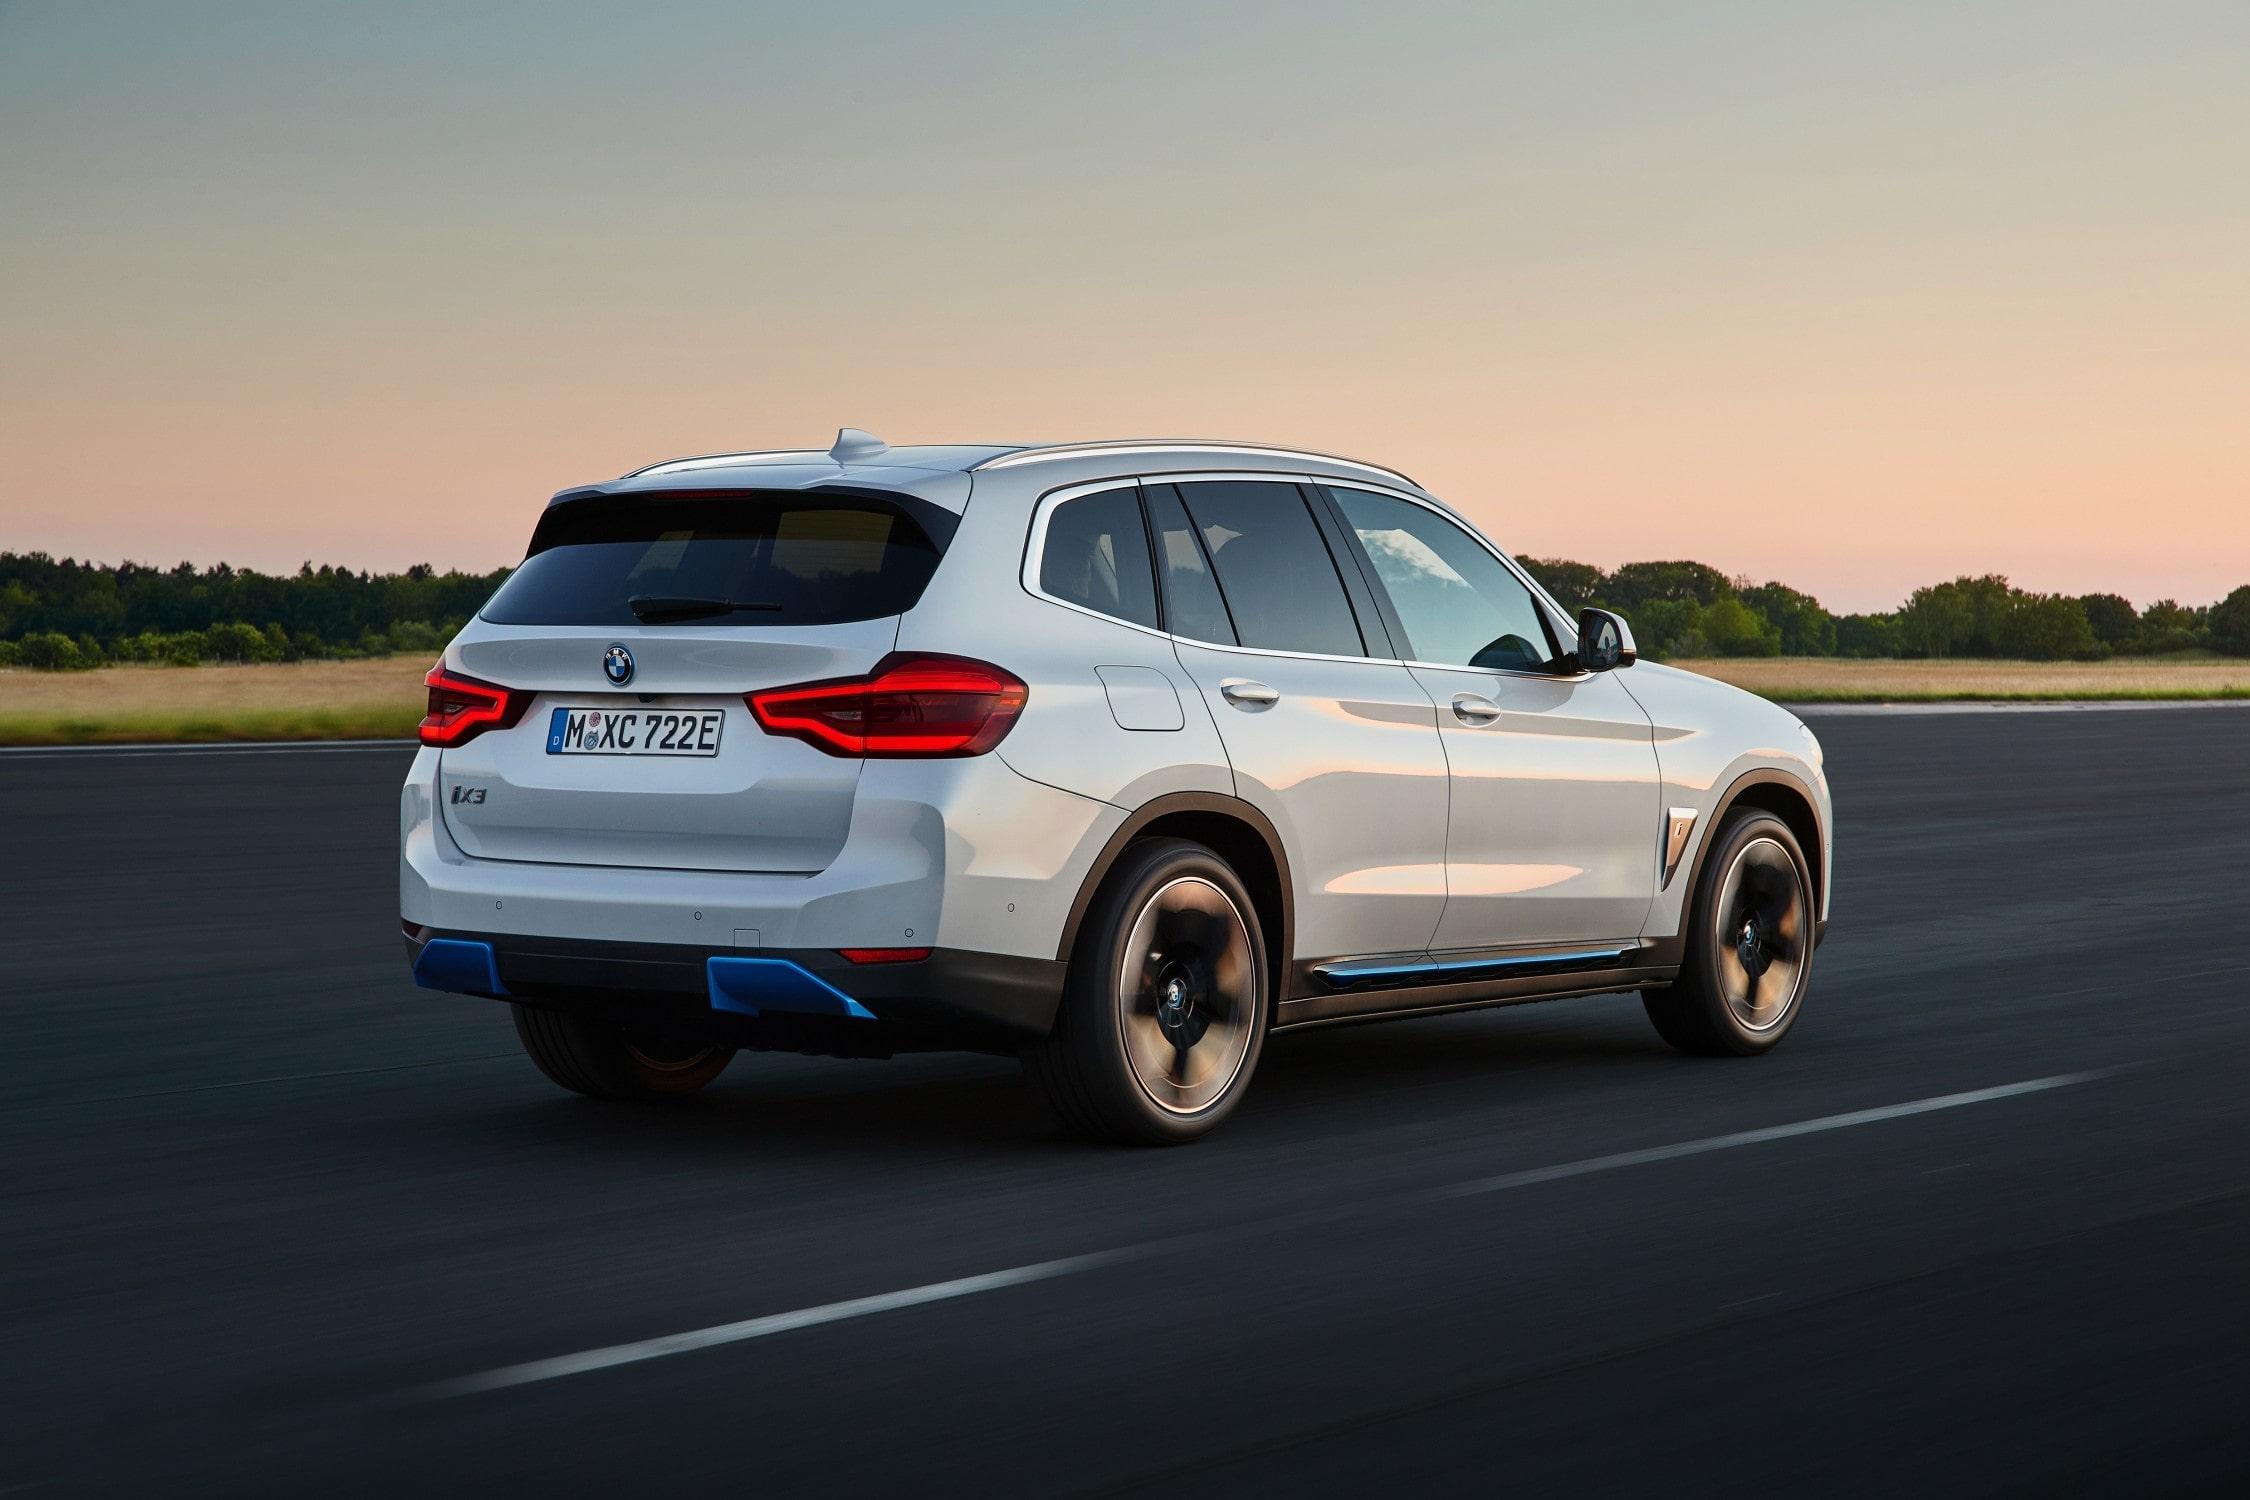 BMW iX3 Rijdend Schuin Achterkant